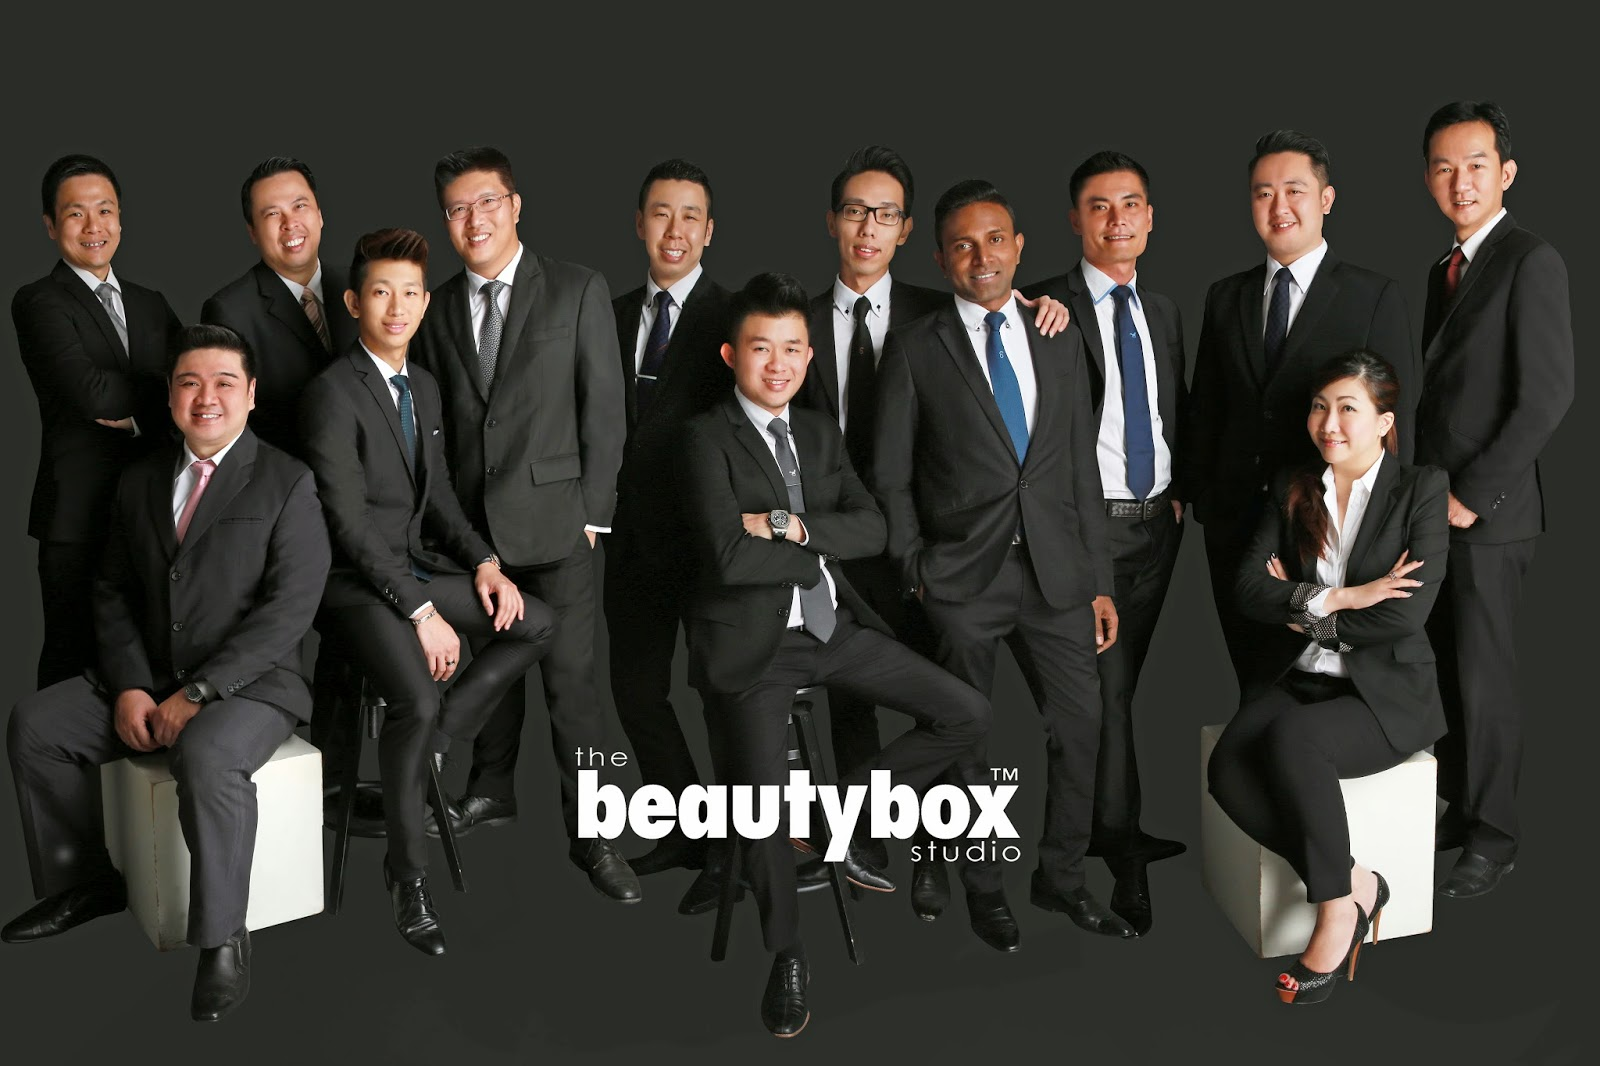 the beautybox studio  corporate group studio photography